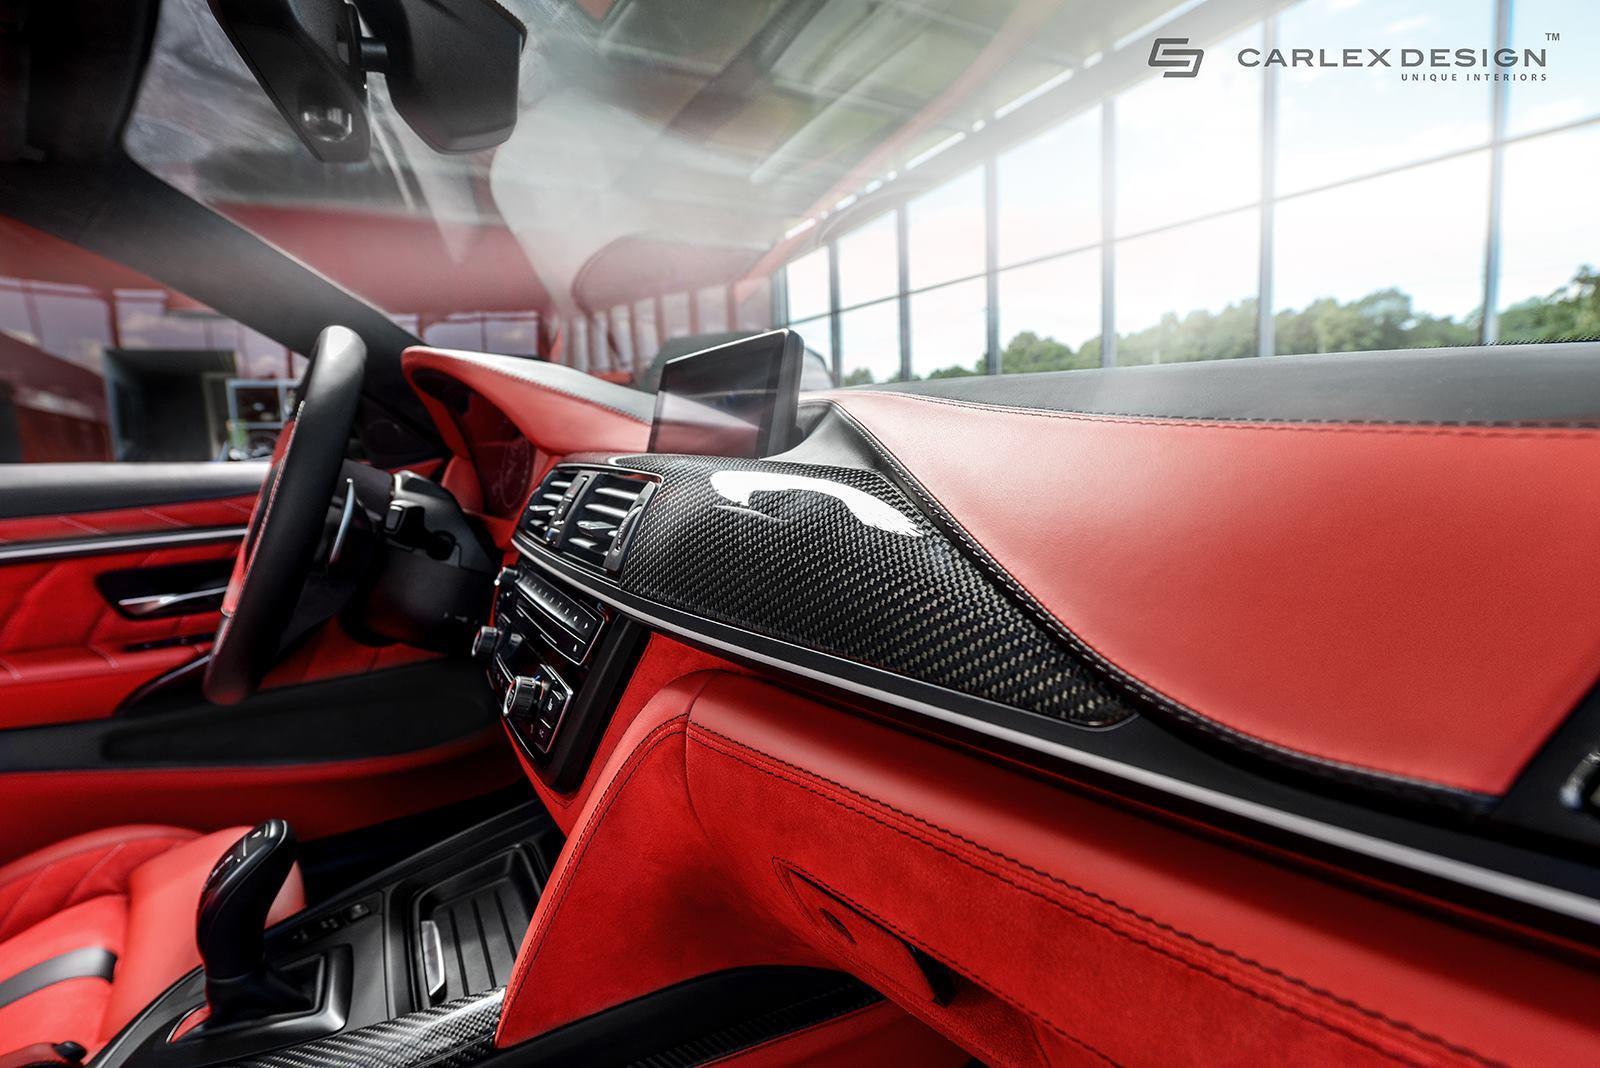 BMW Seria 4 Cabriolet by Carlex Design - BMW Seria 4 Cabriolet by Carlex Design